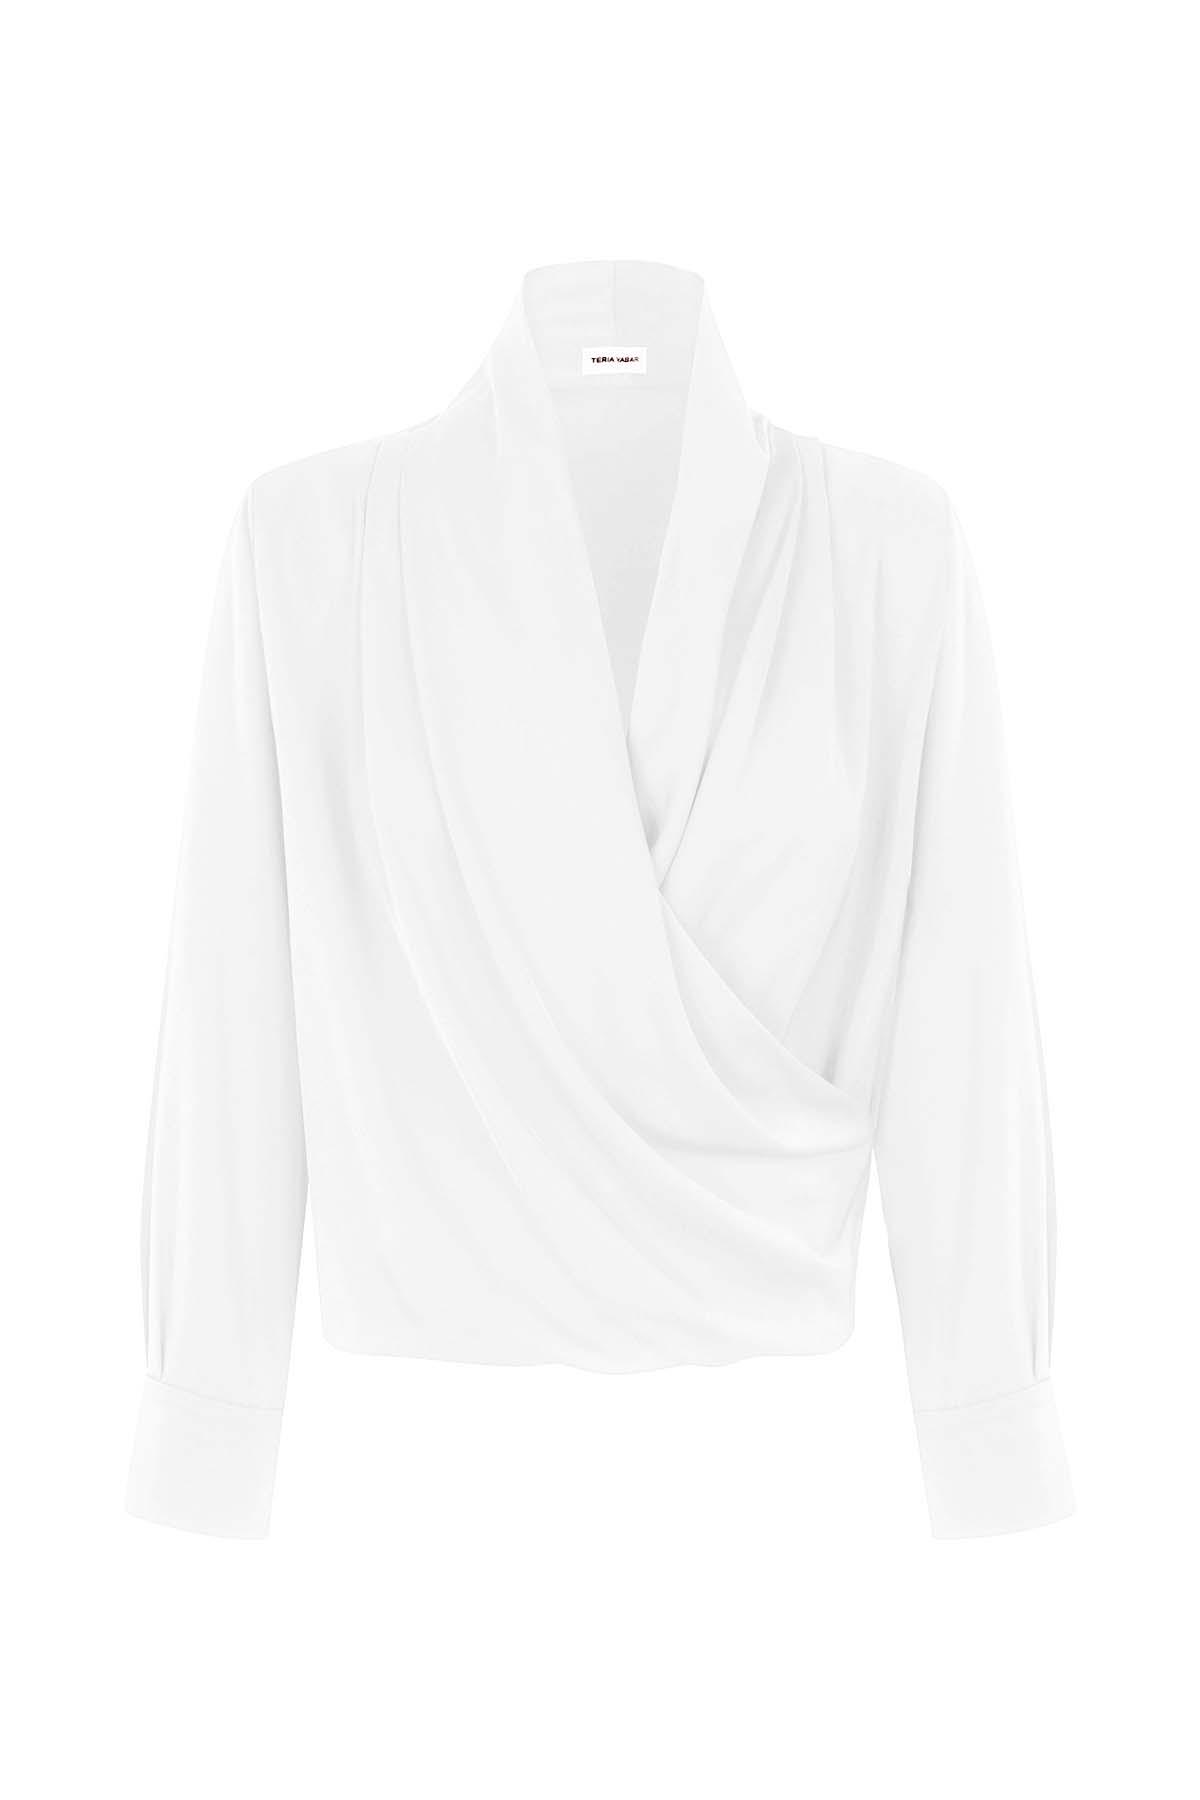 Teria Yabar - Camisa Passy blanc